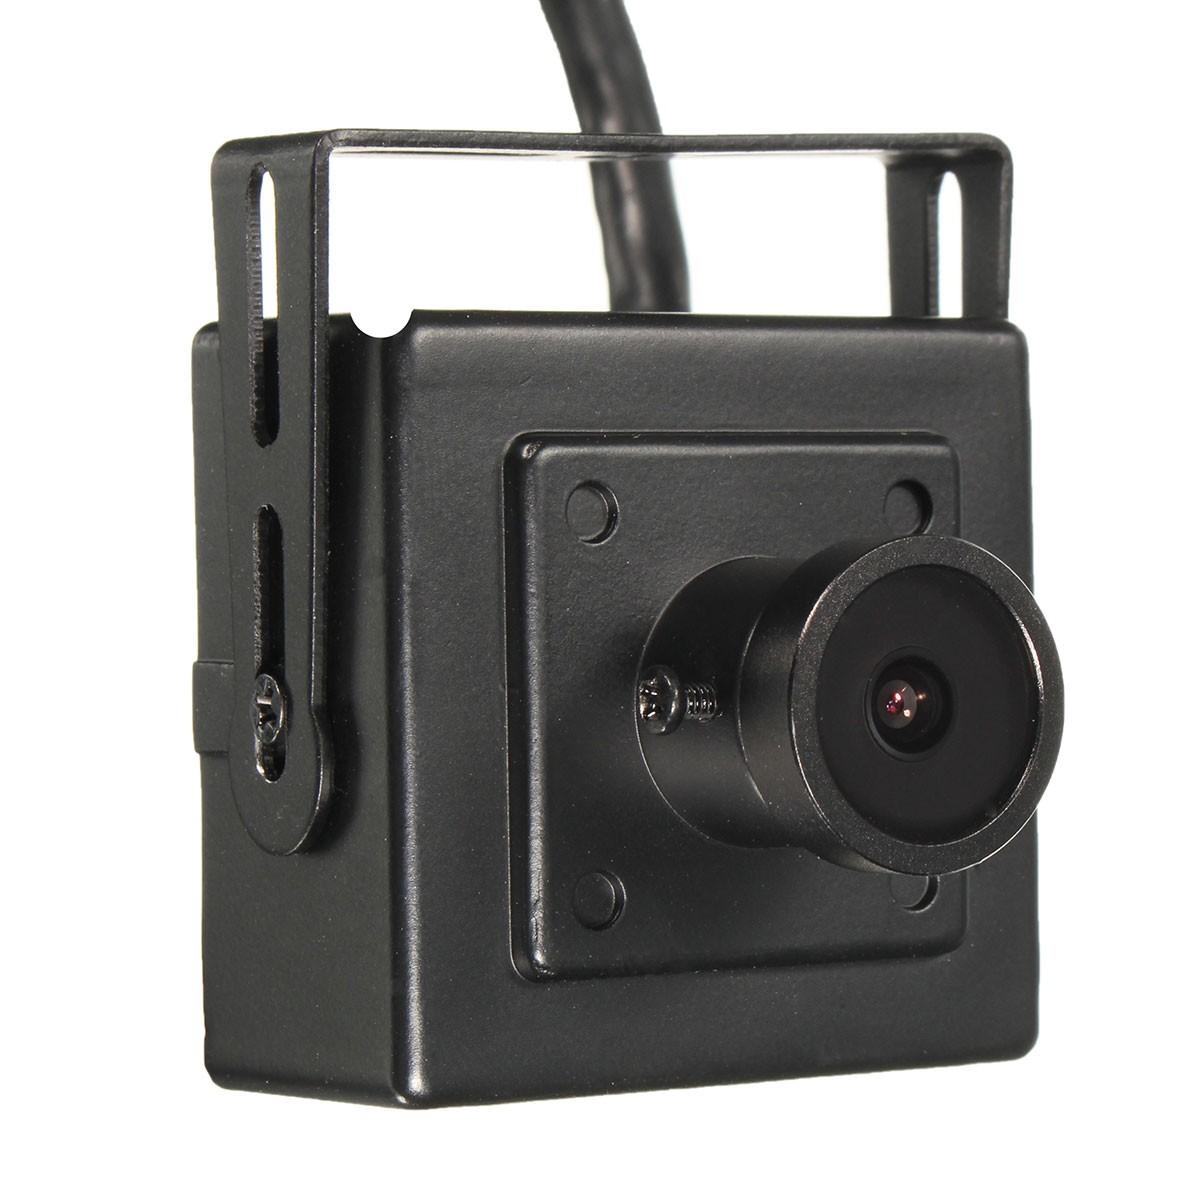 hd 720p hidden wired mini cctv ip camera network digital video cmos safty elec mall. Black Bedroom Furniture Sets. Home Design Ideas